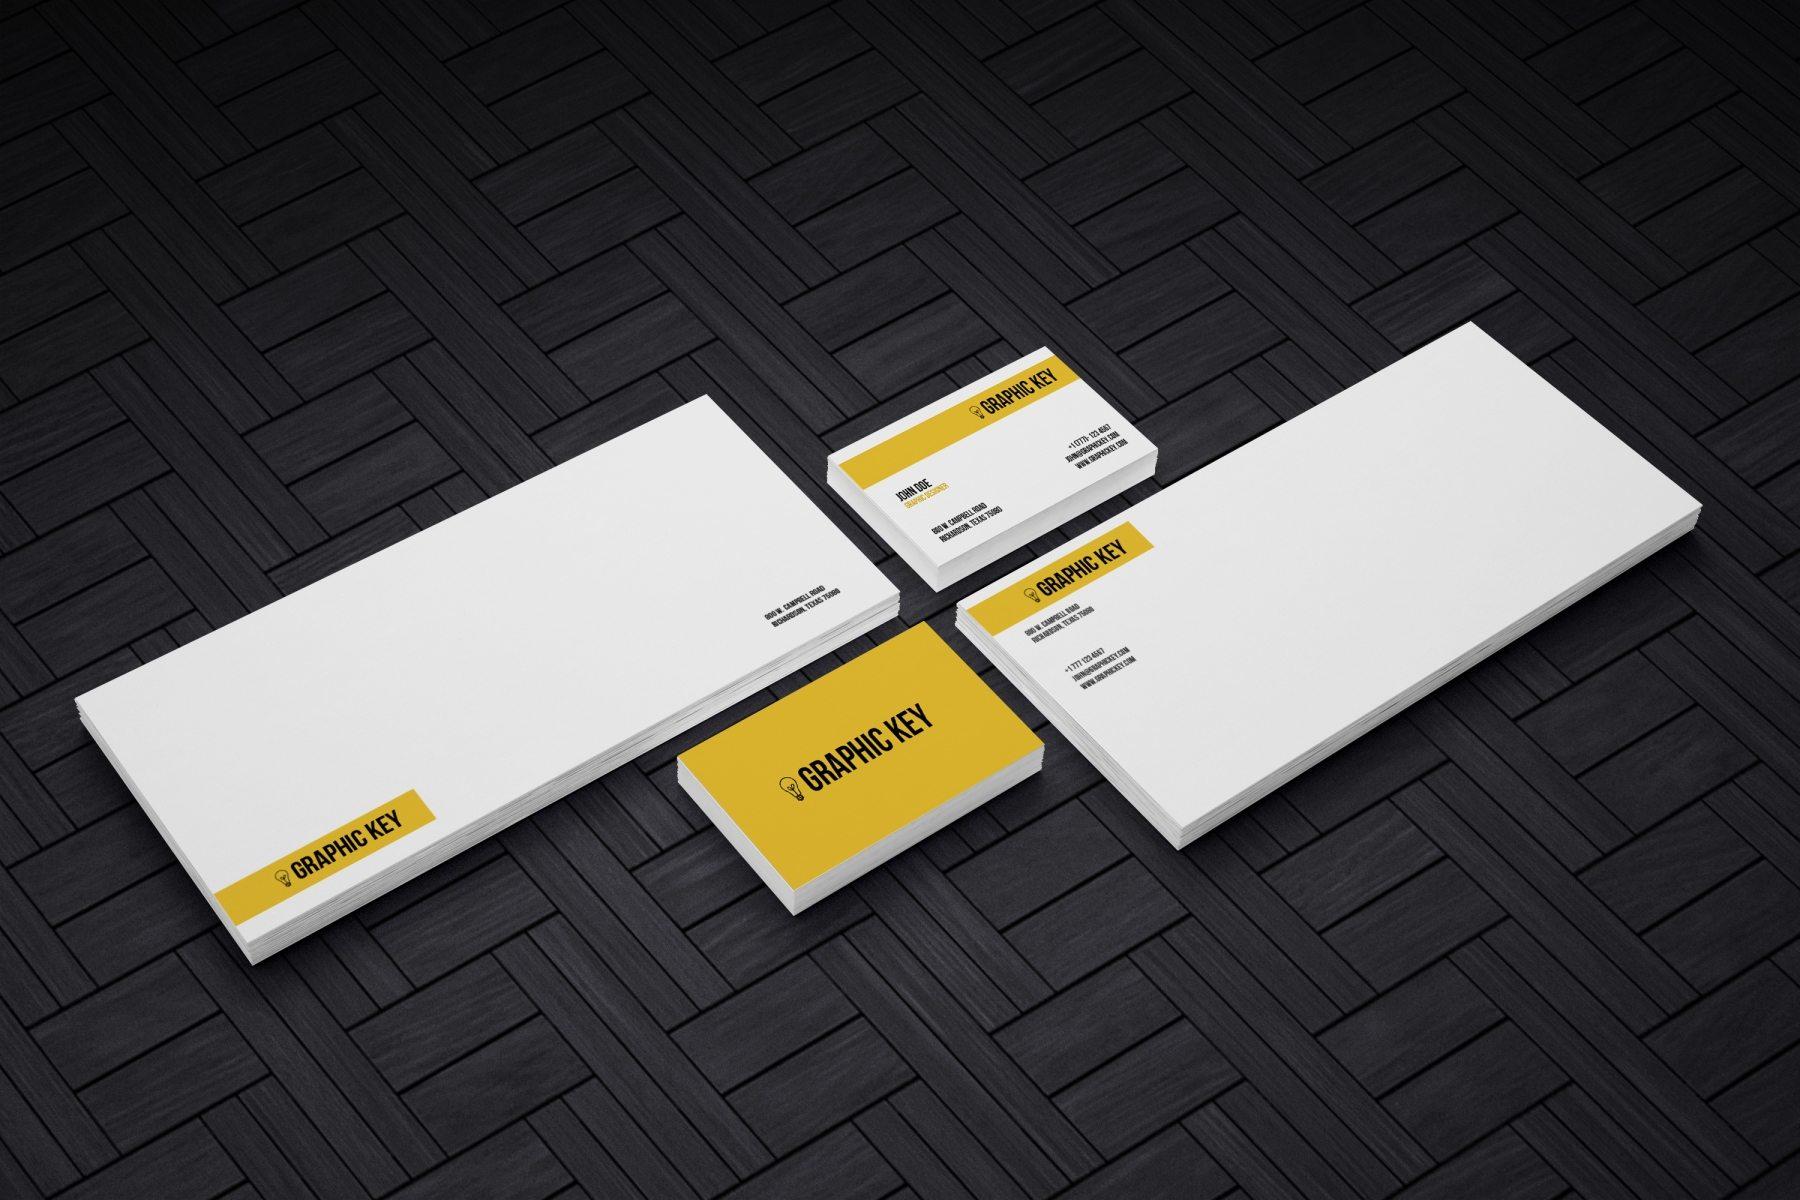 1569743667 5386a49cebc8484 - 黄色系简约纯色办公企业vi样机